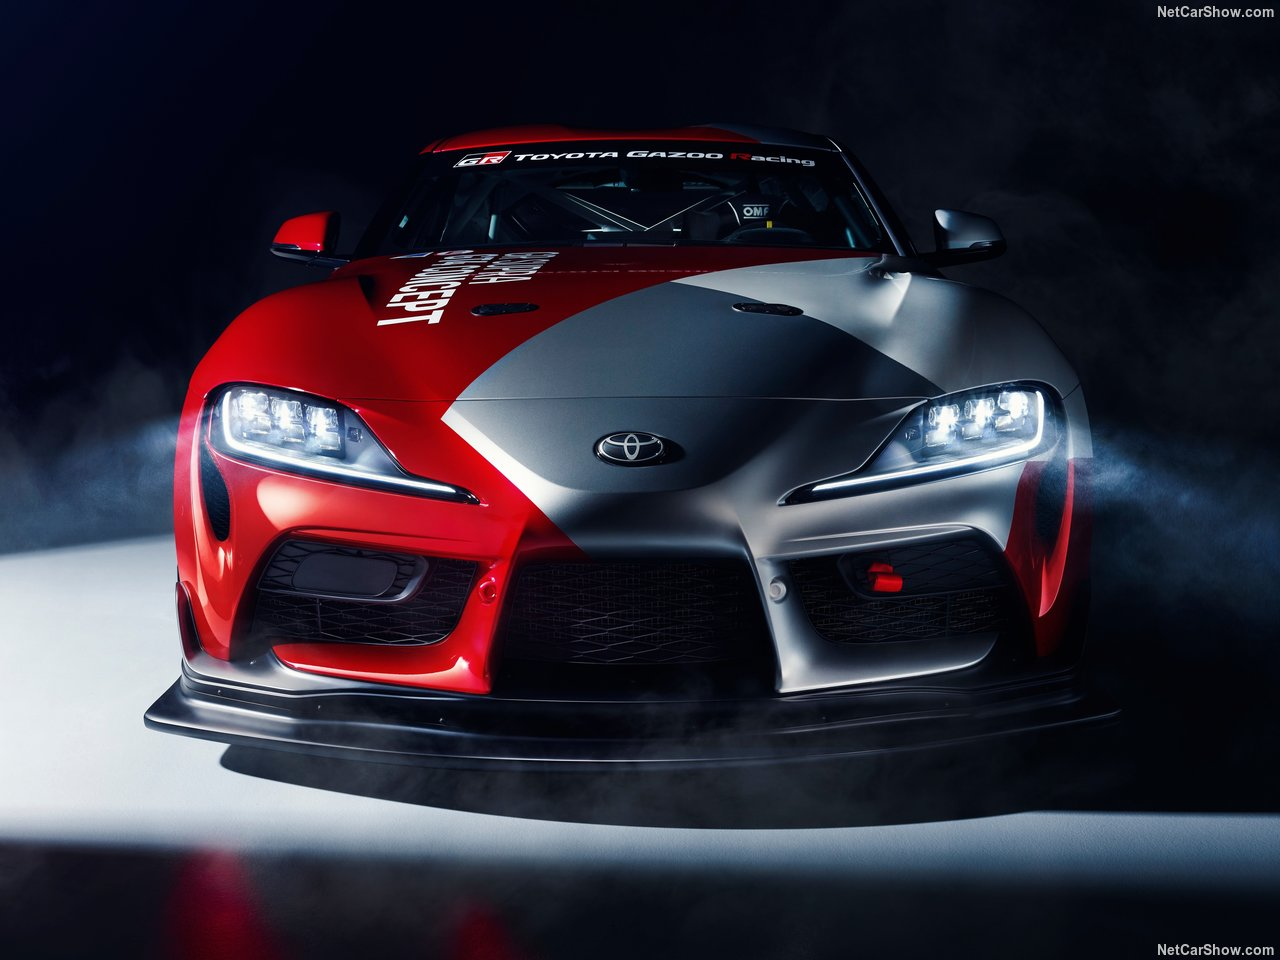 Toyota GR Supra GT4 Concept Revealed Ahead of Geneva Auto Show 2